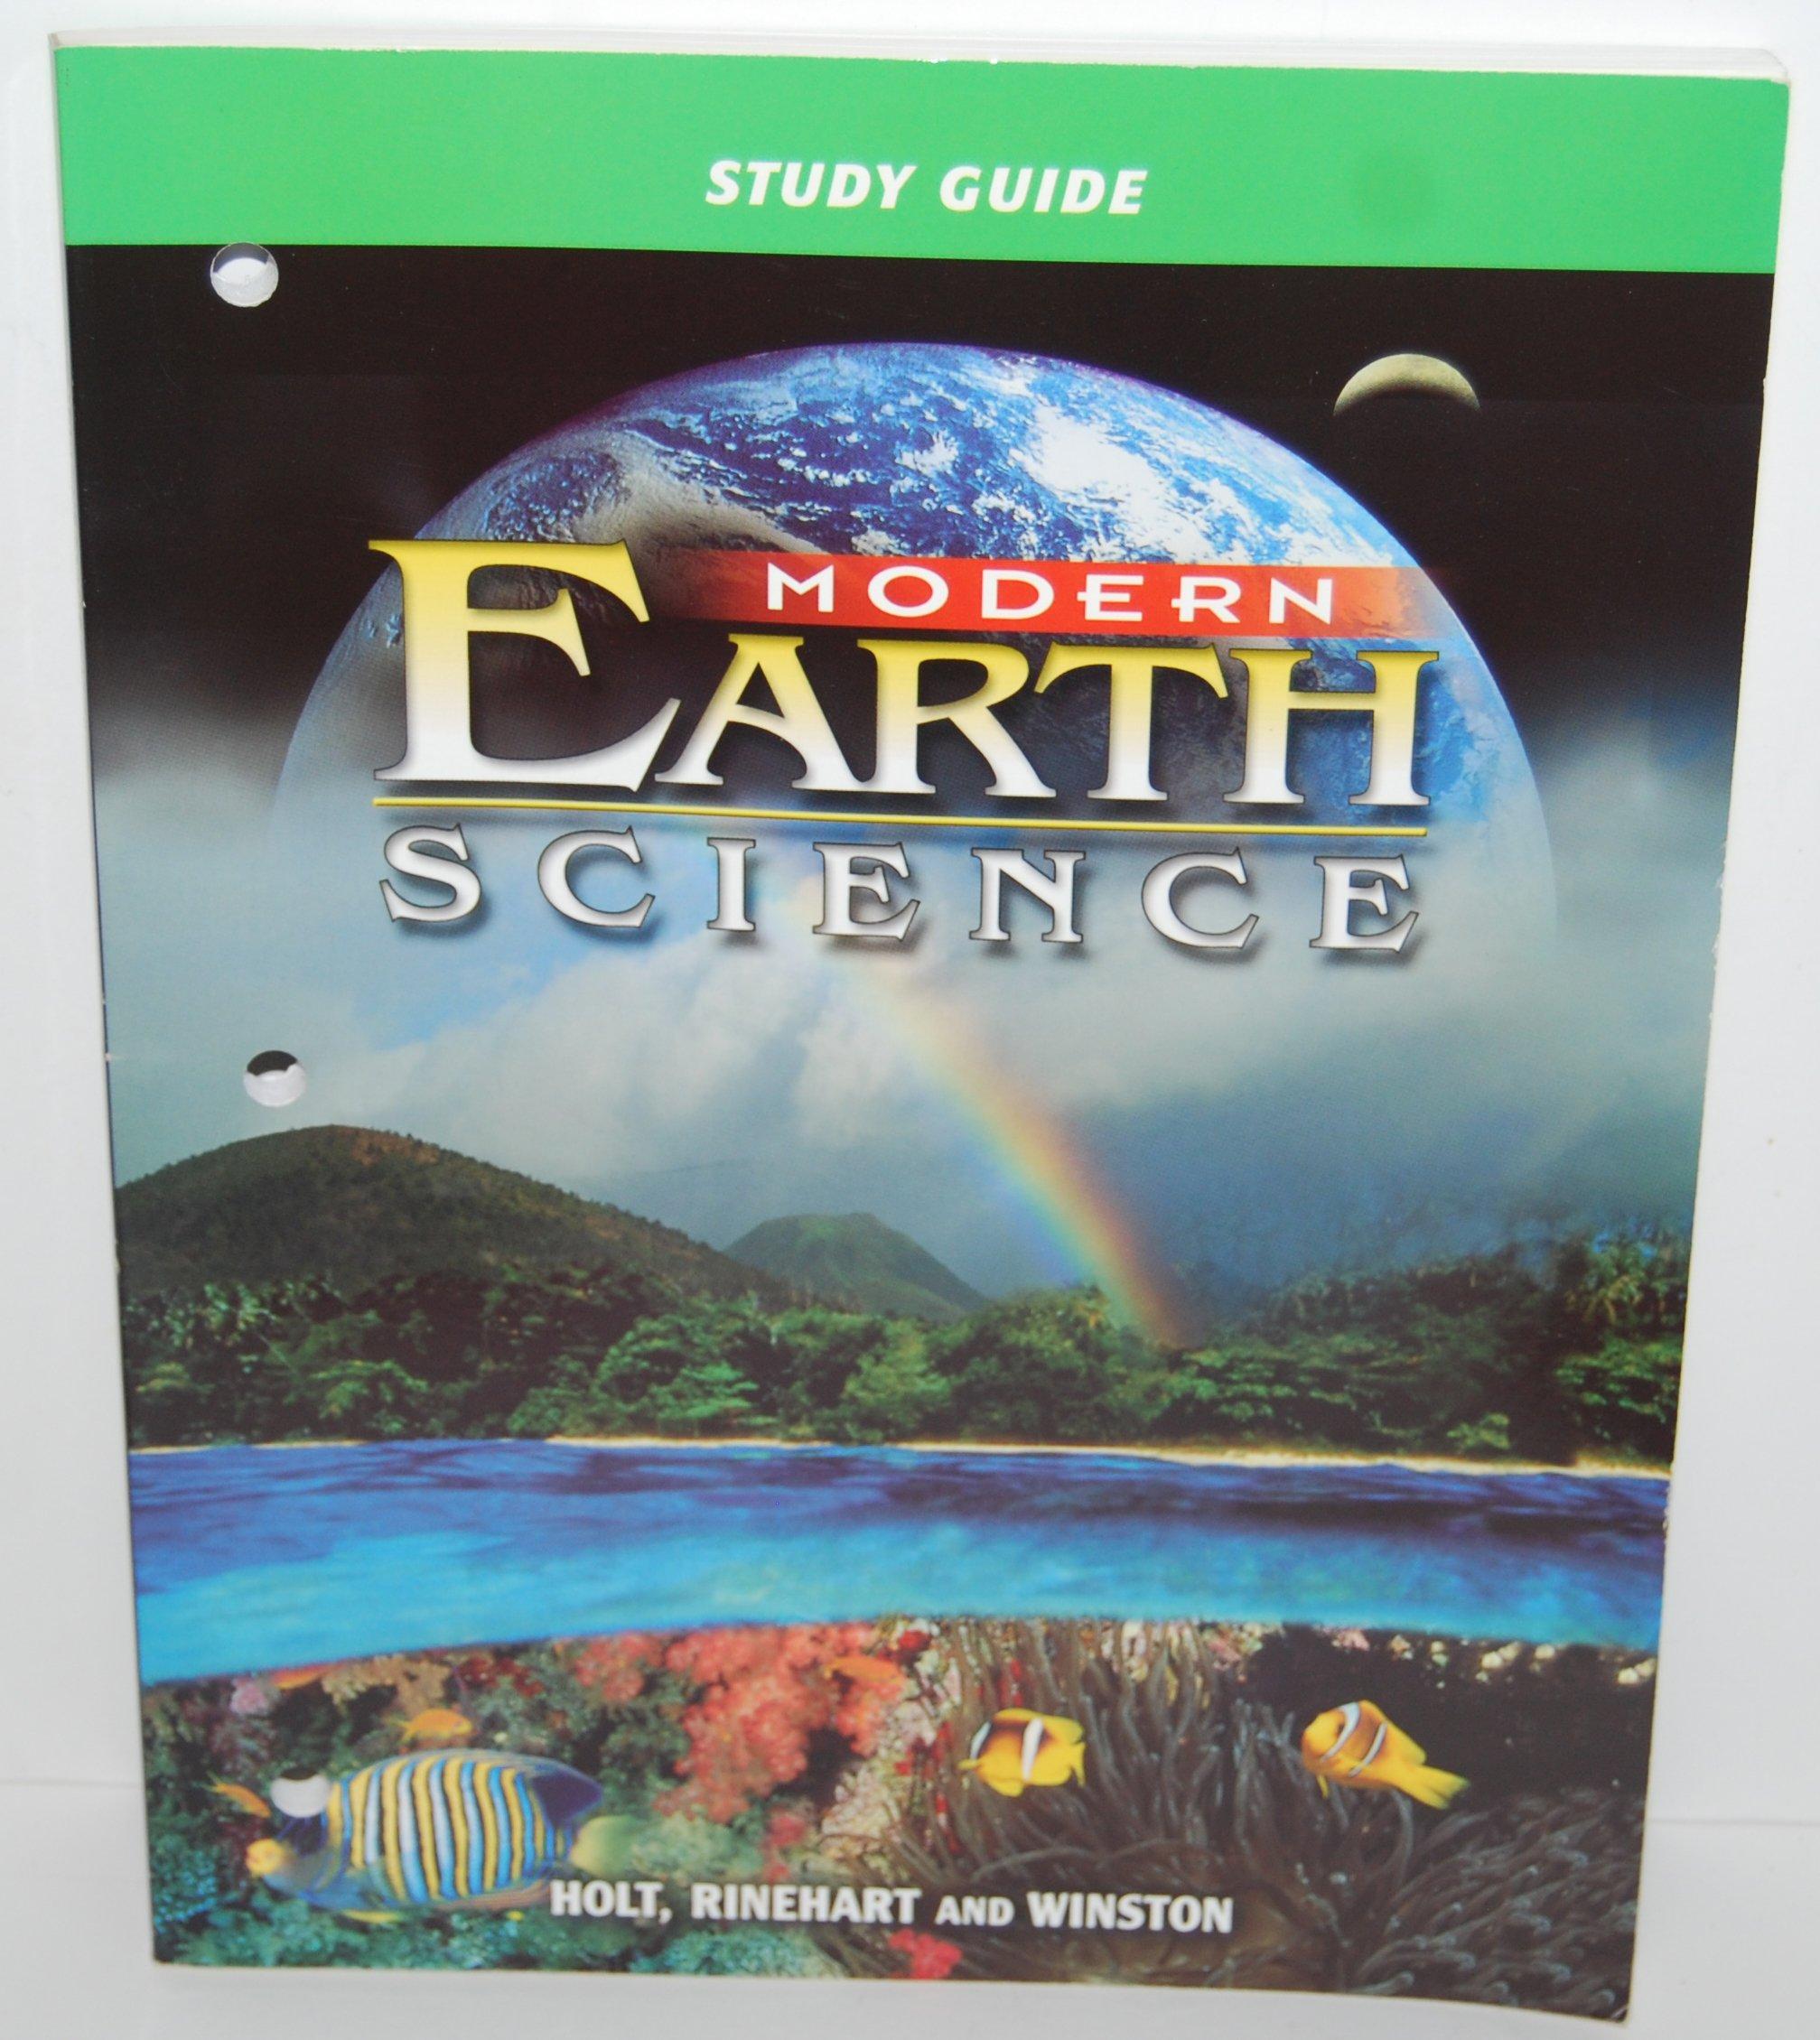 Modern earth science study guide holt rinehart winston modern earth science study guide holt rinehart winston 9780030643149 amazon books fandeluxe Images